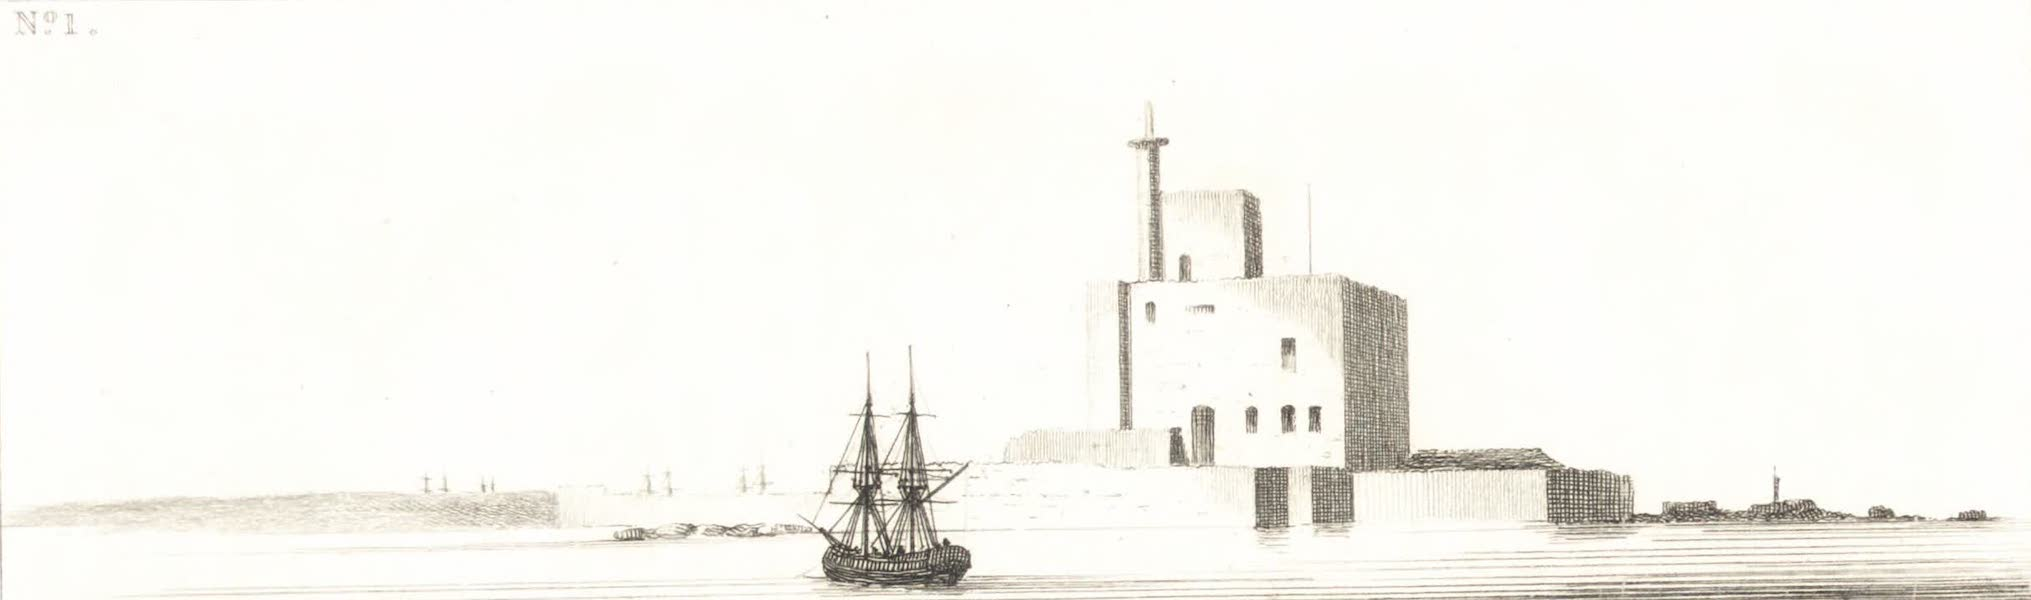 Journal of a Tour in the Levant Vol. 2 - Suez No. 1 (1820)